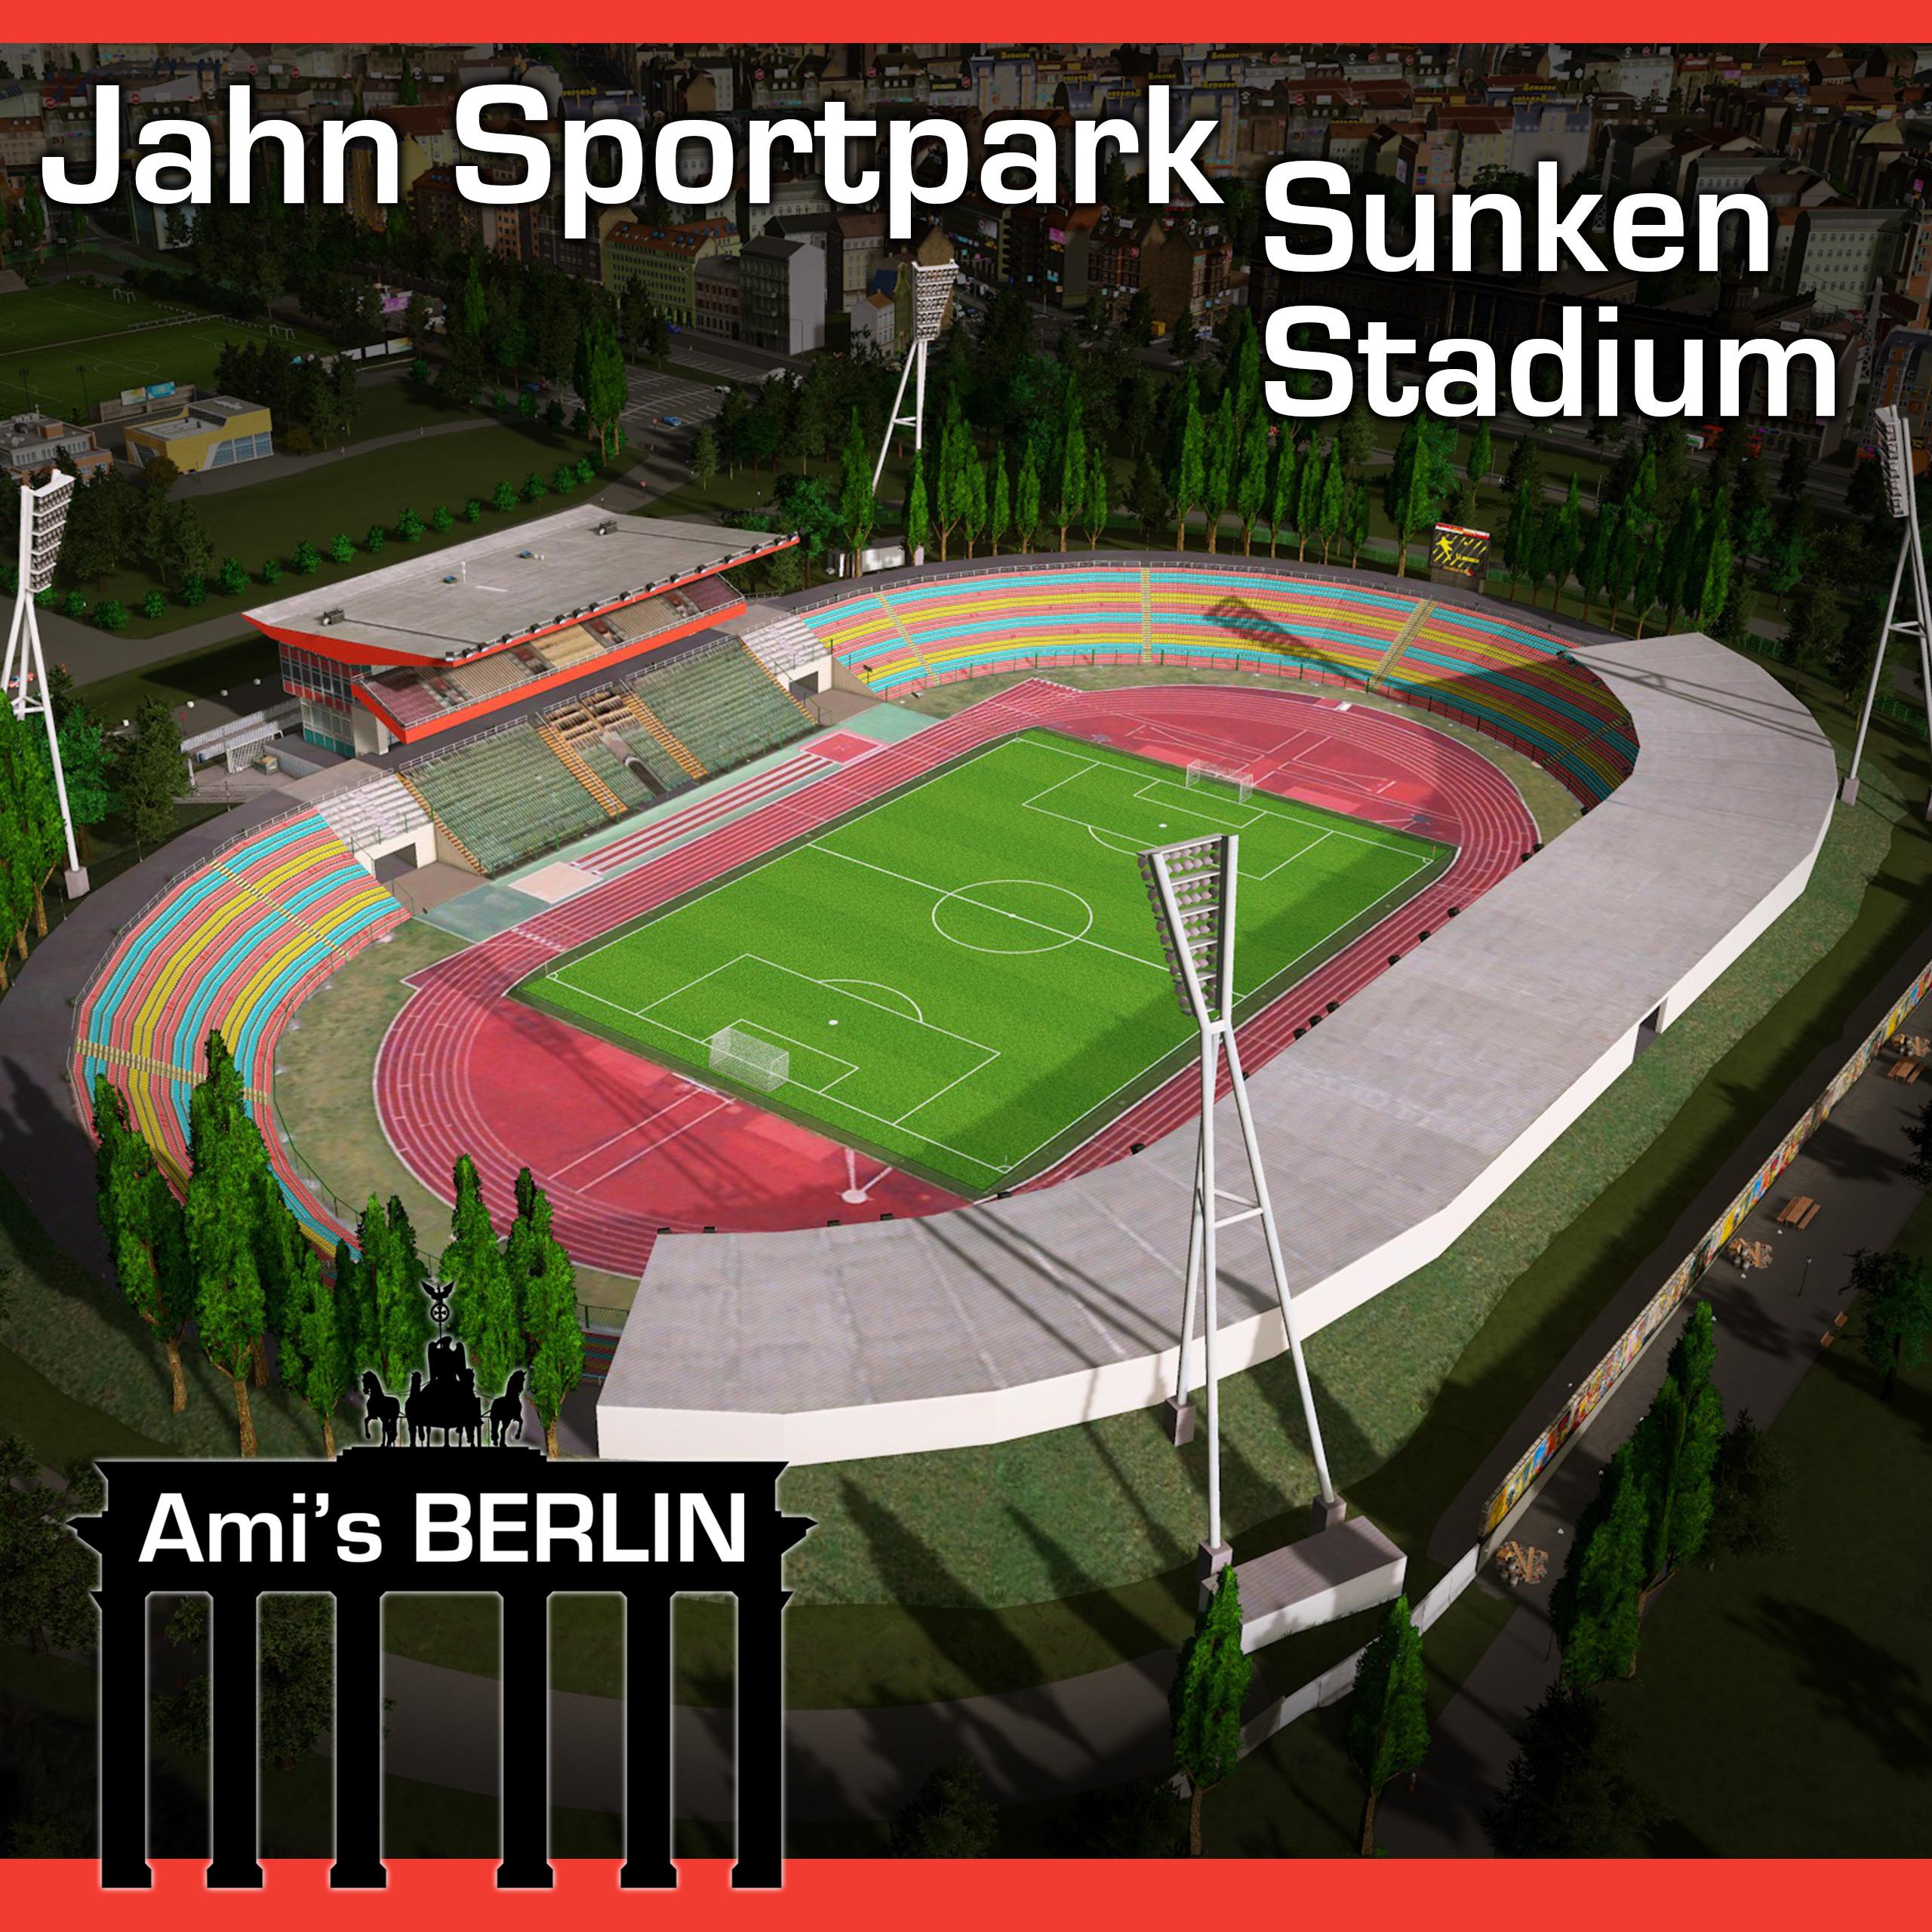 sunken-stadium2.jpg